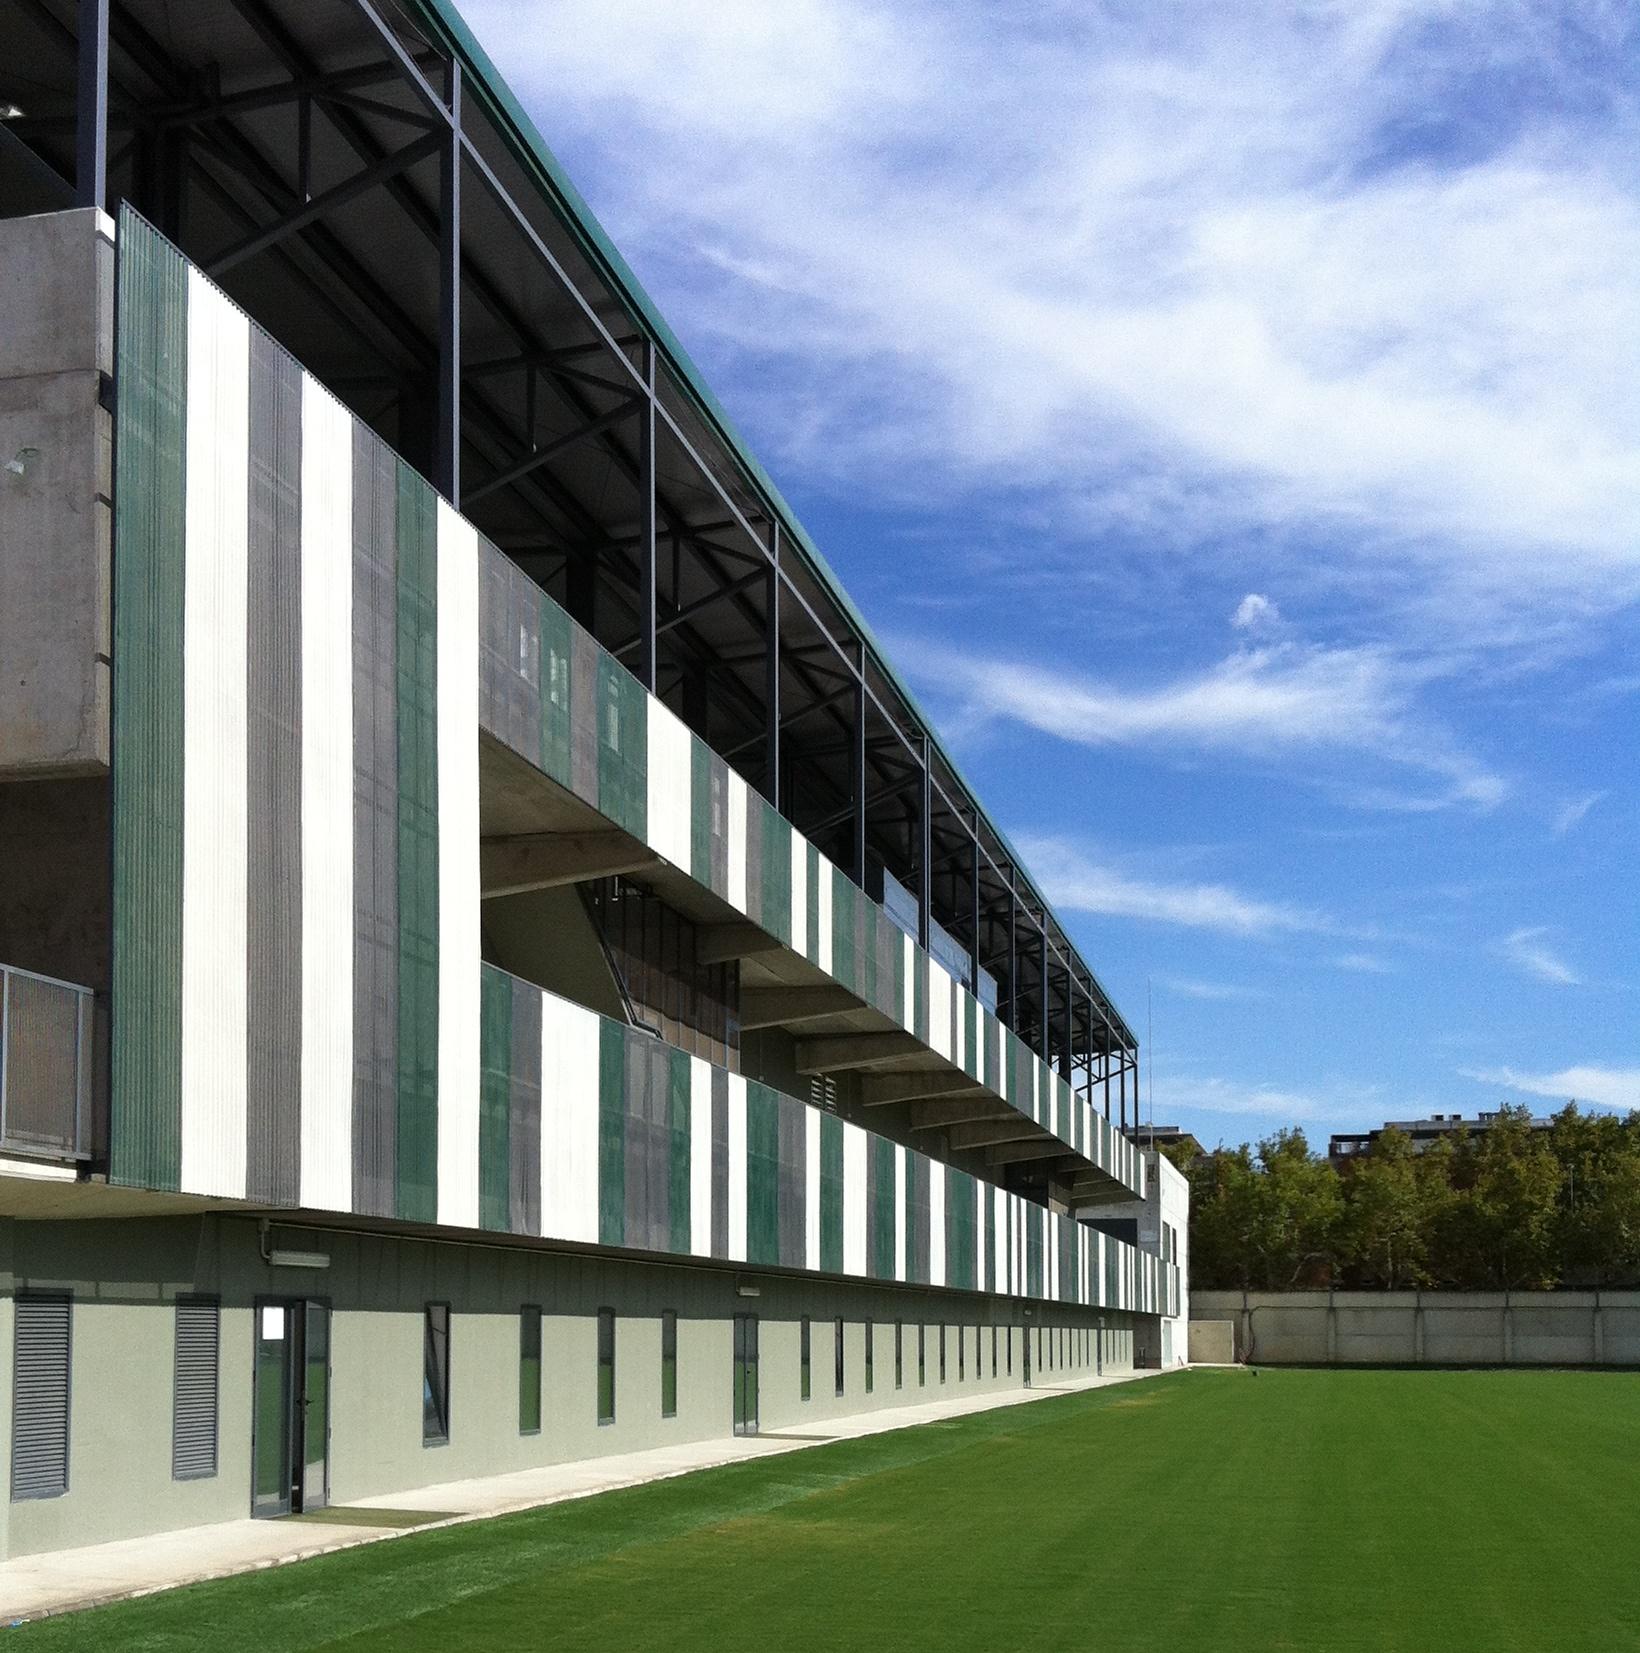 Ciudad Deportiva Real Betis Balompié